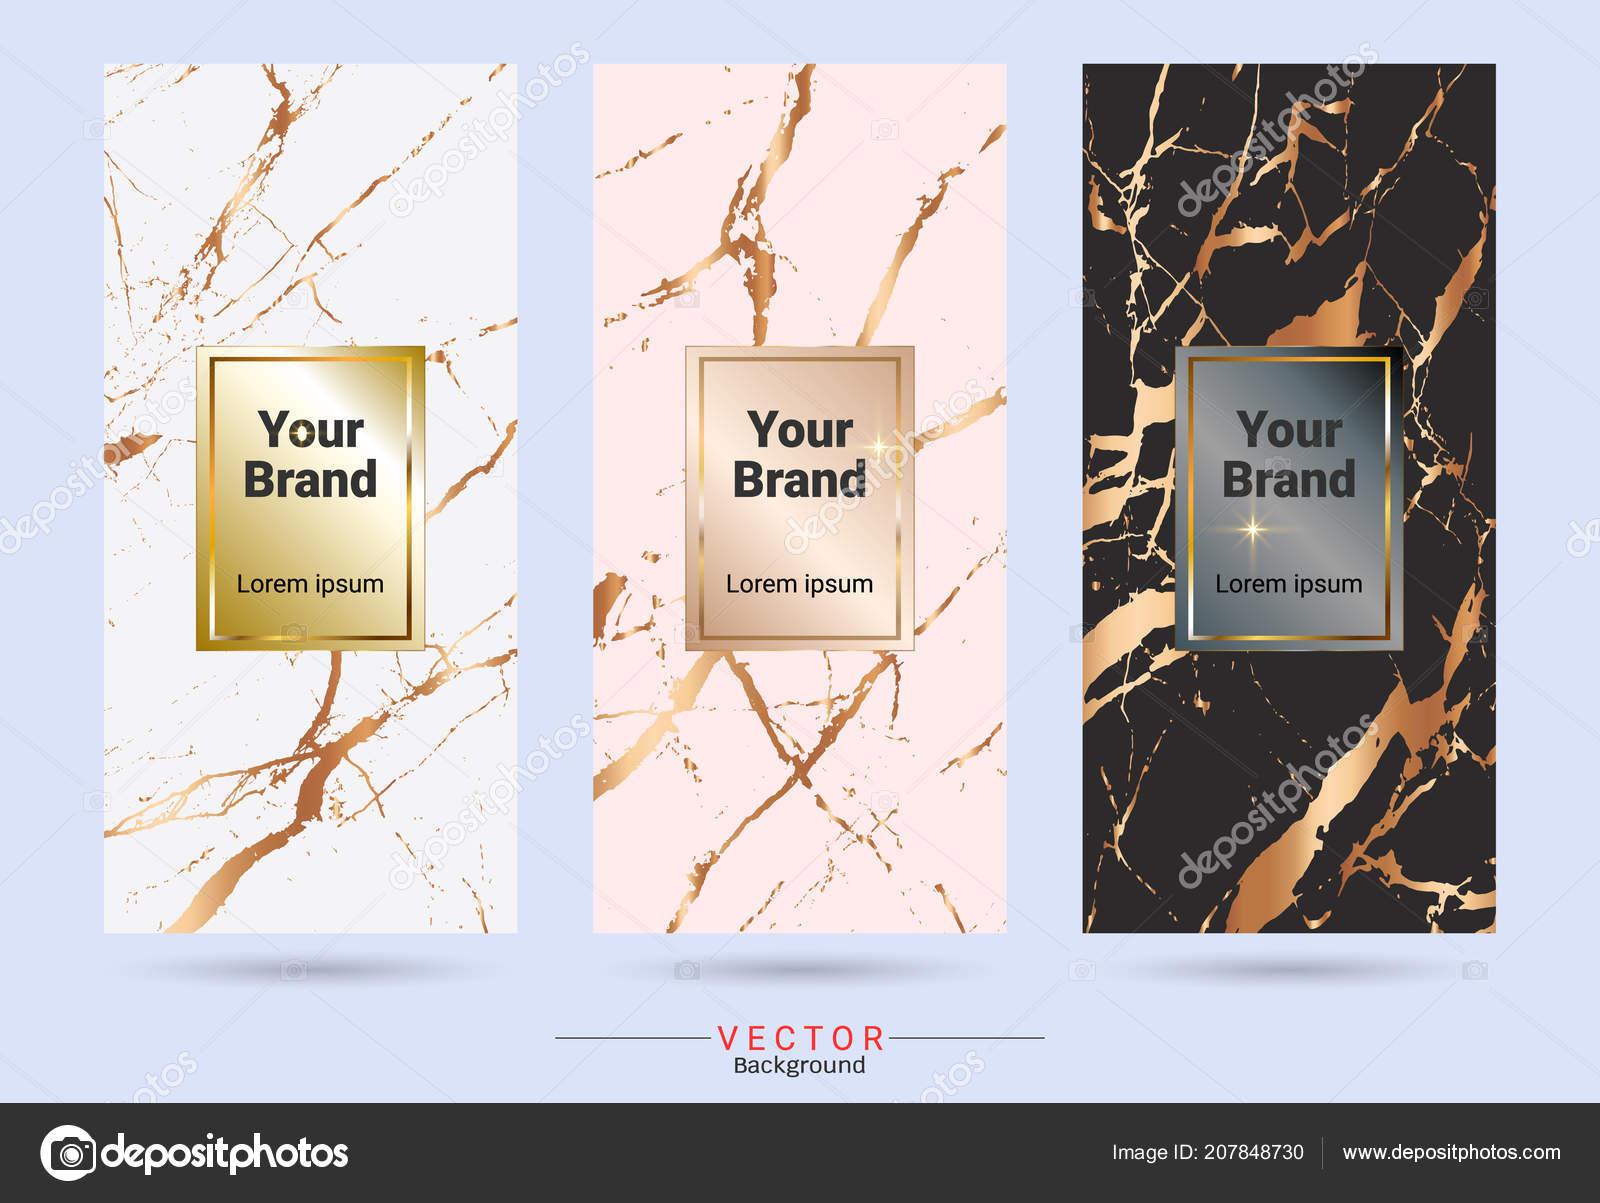 Embalaje Premium Caja Etiqueta Etiquetas Engomadas Plantillas Diseño ...